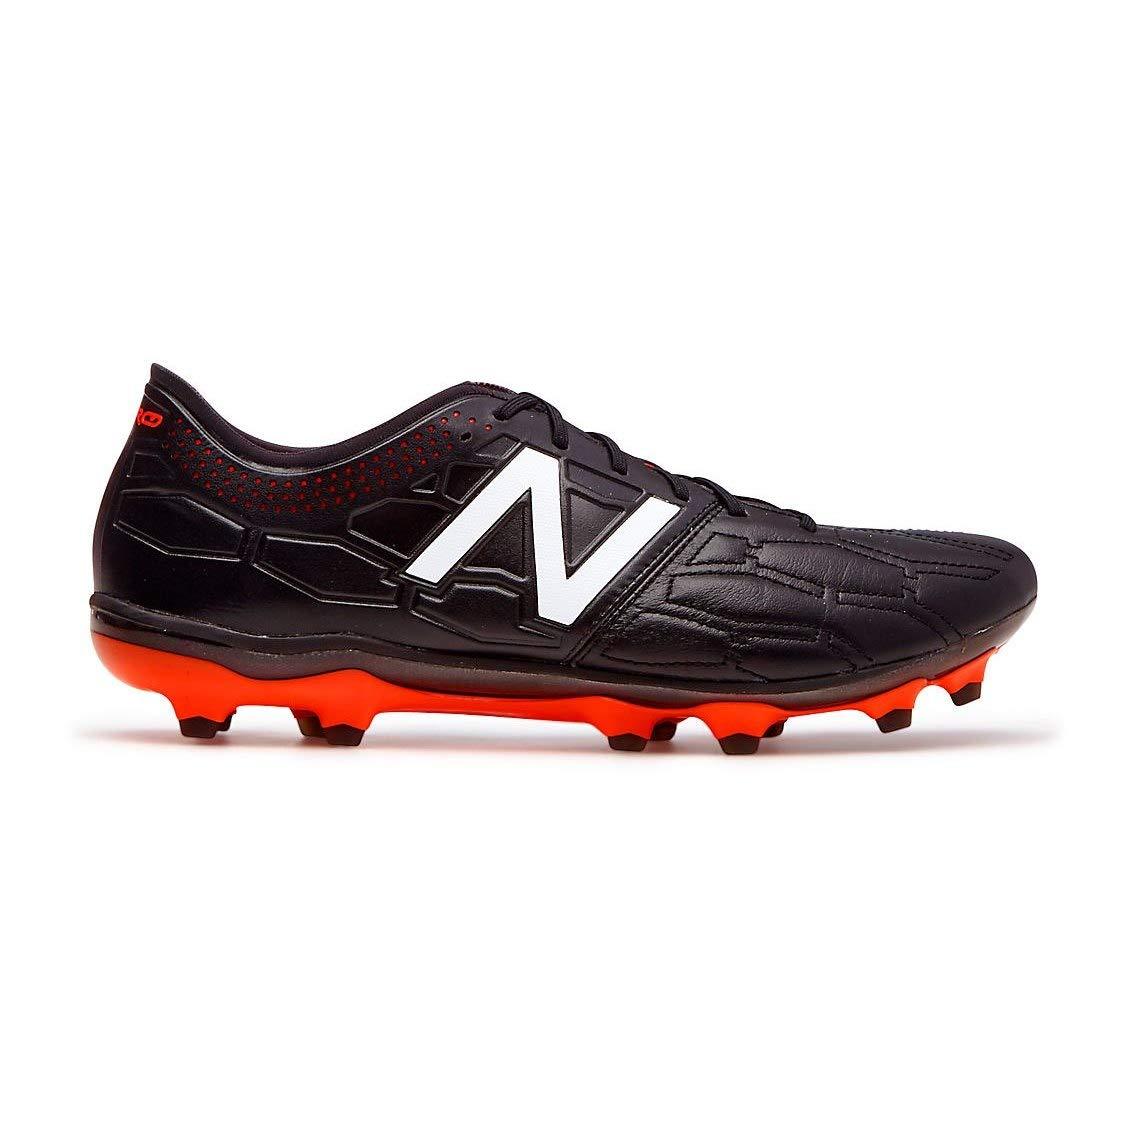 9d891297d6 Amazon.com: New Balance Visaro 2.0 Pro K Leather FG Football Boots - Adult  - Black/Alpha Orange - UK Shoe Size 8: Sports & Outdoors